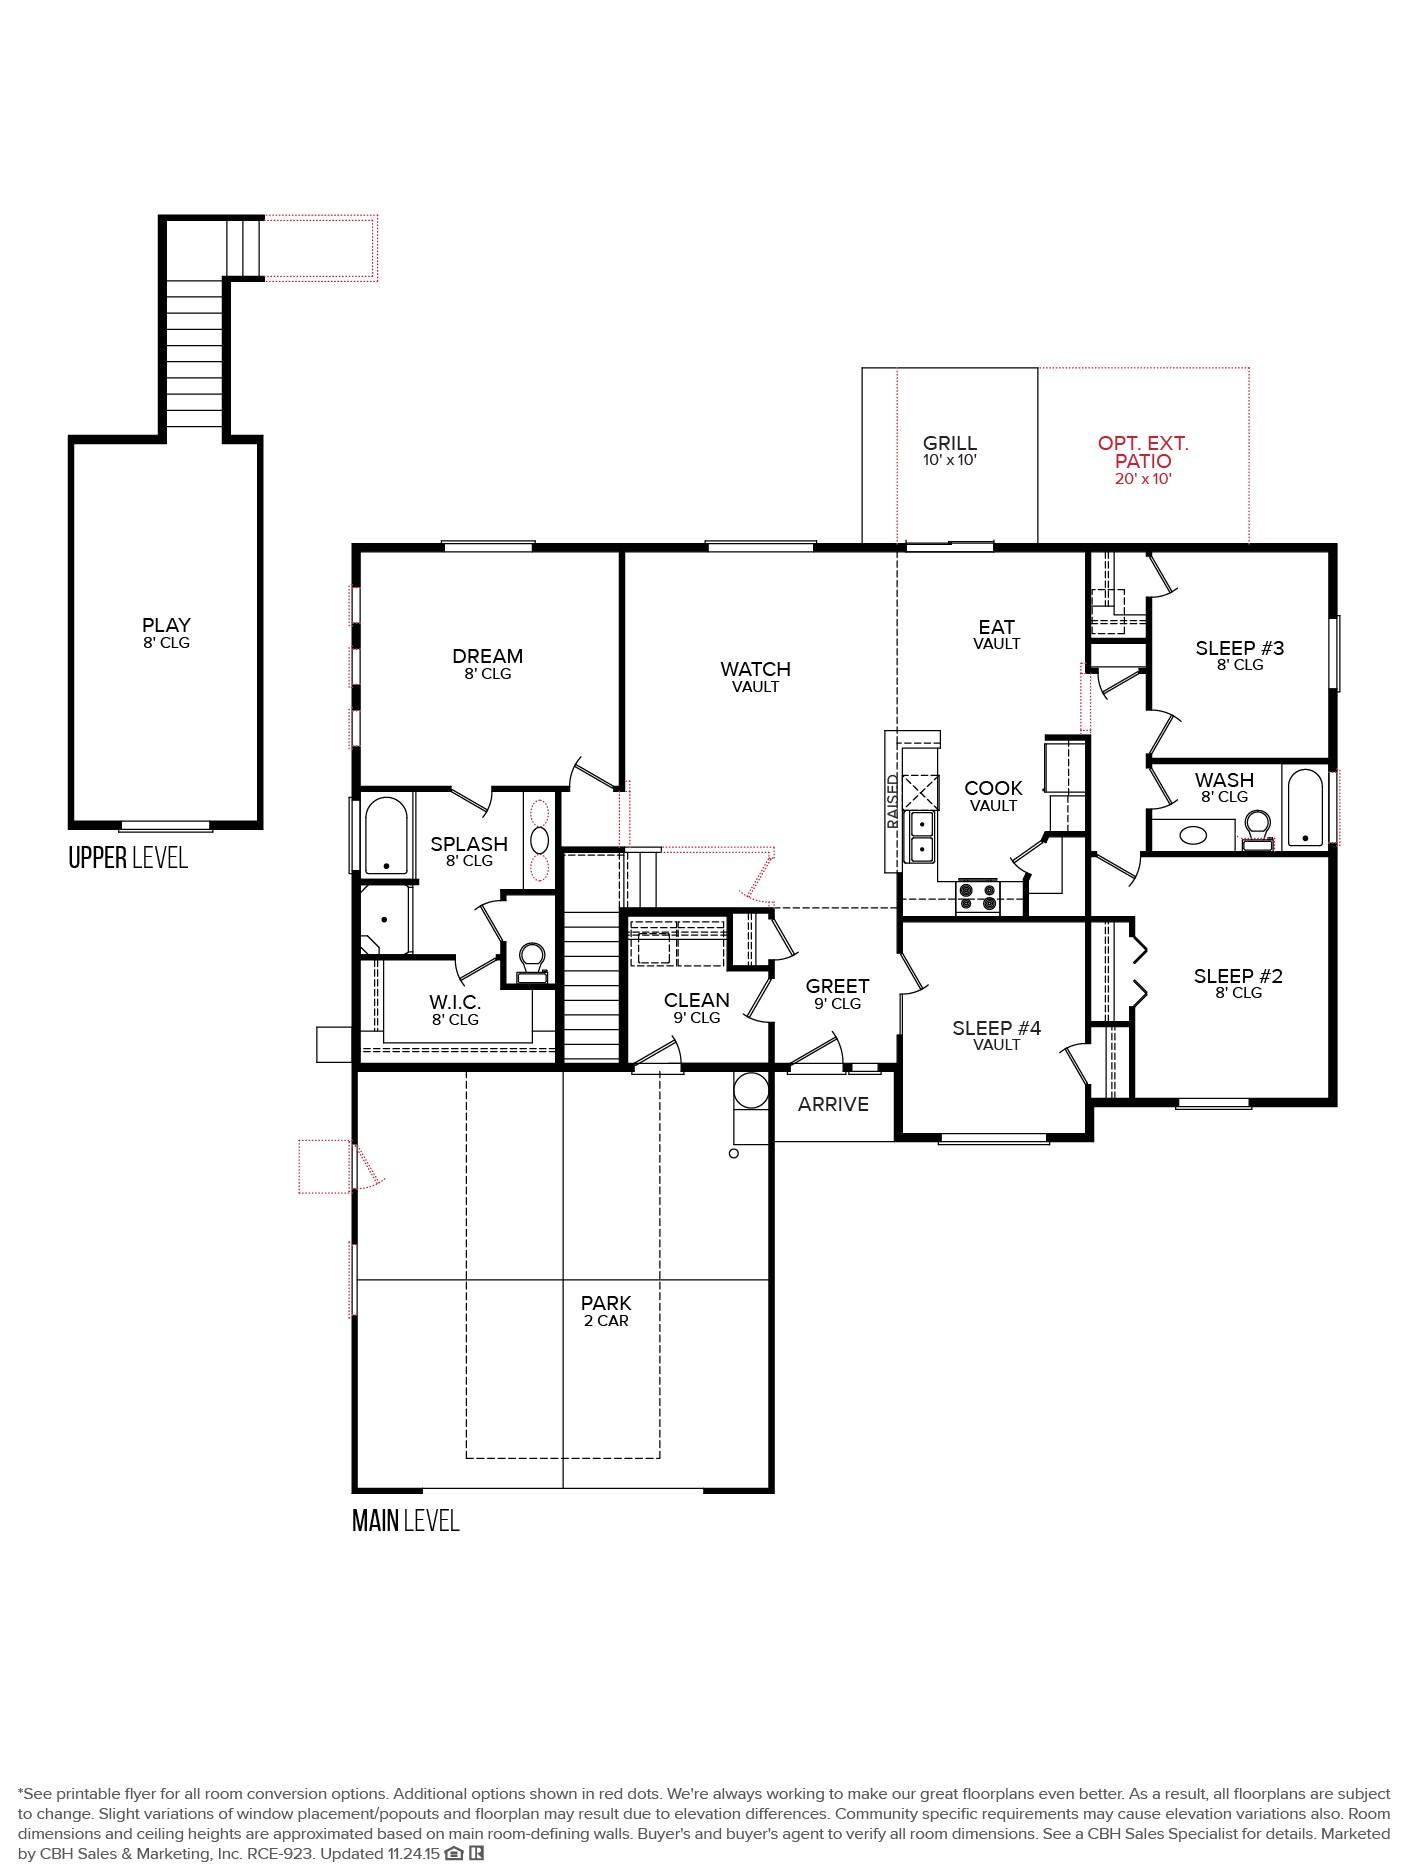 Cbh Homes Floor Plans Cbh Homes northern 1996 Floor Plan